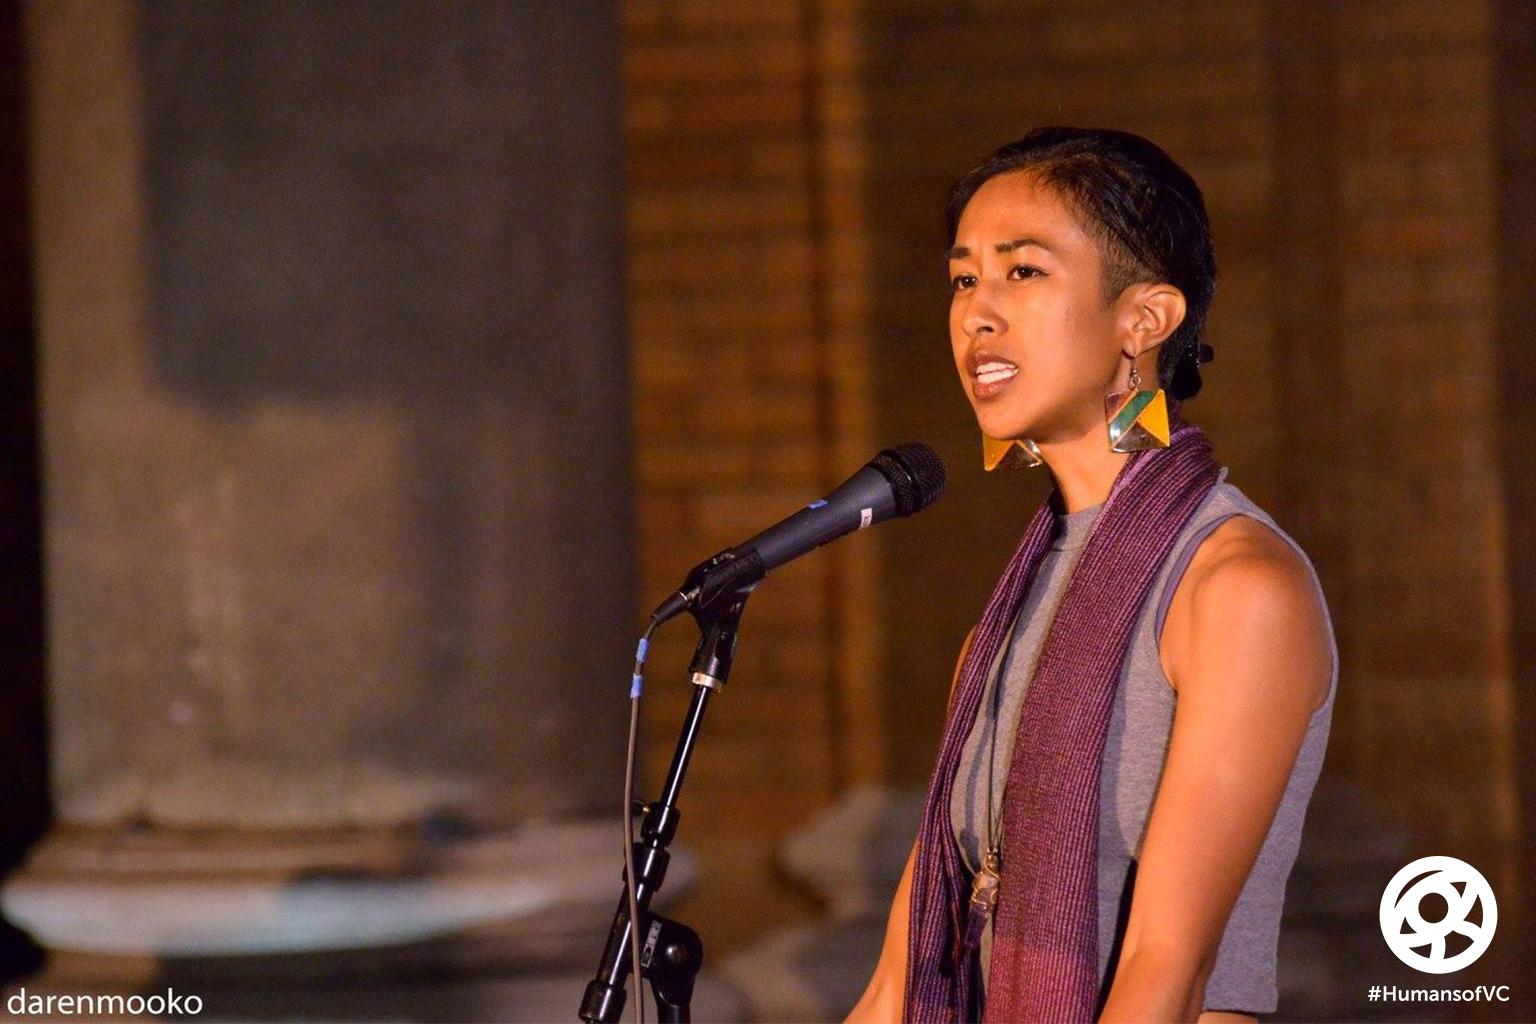 June Kaewsith (Jumakae), LAAPFF Programmer (2015-2017)/Artist